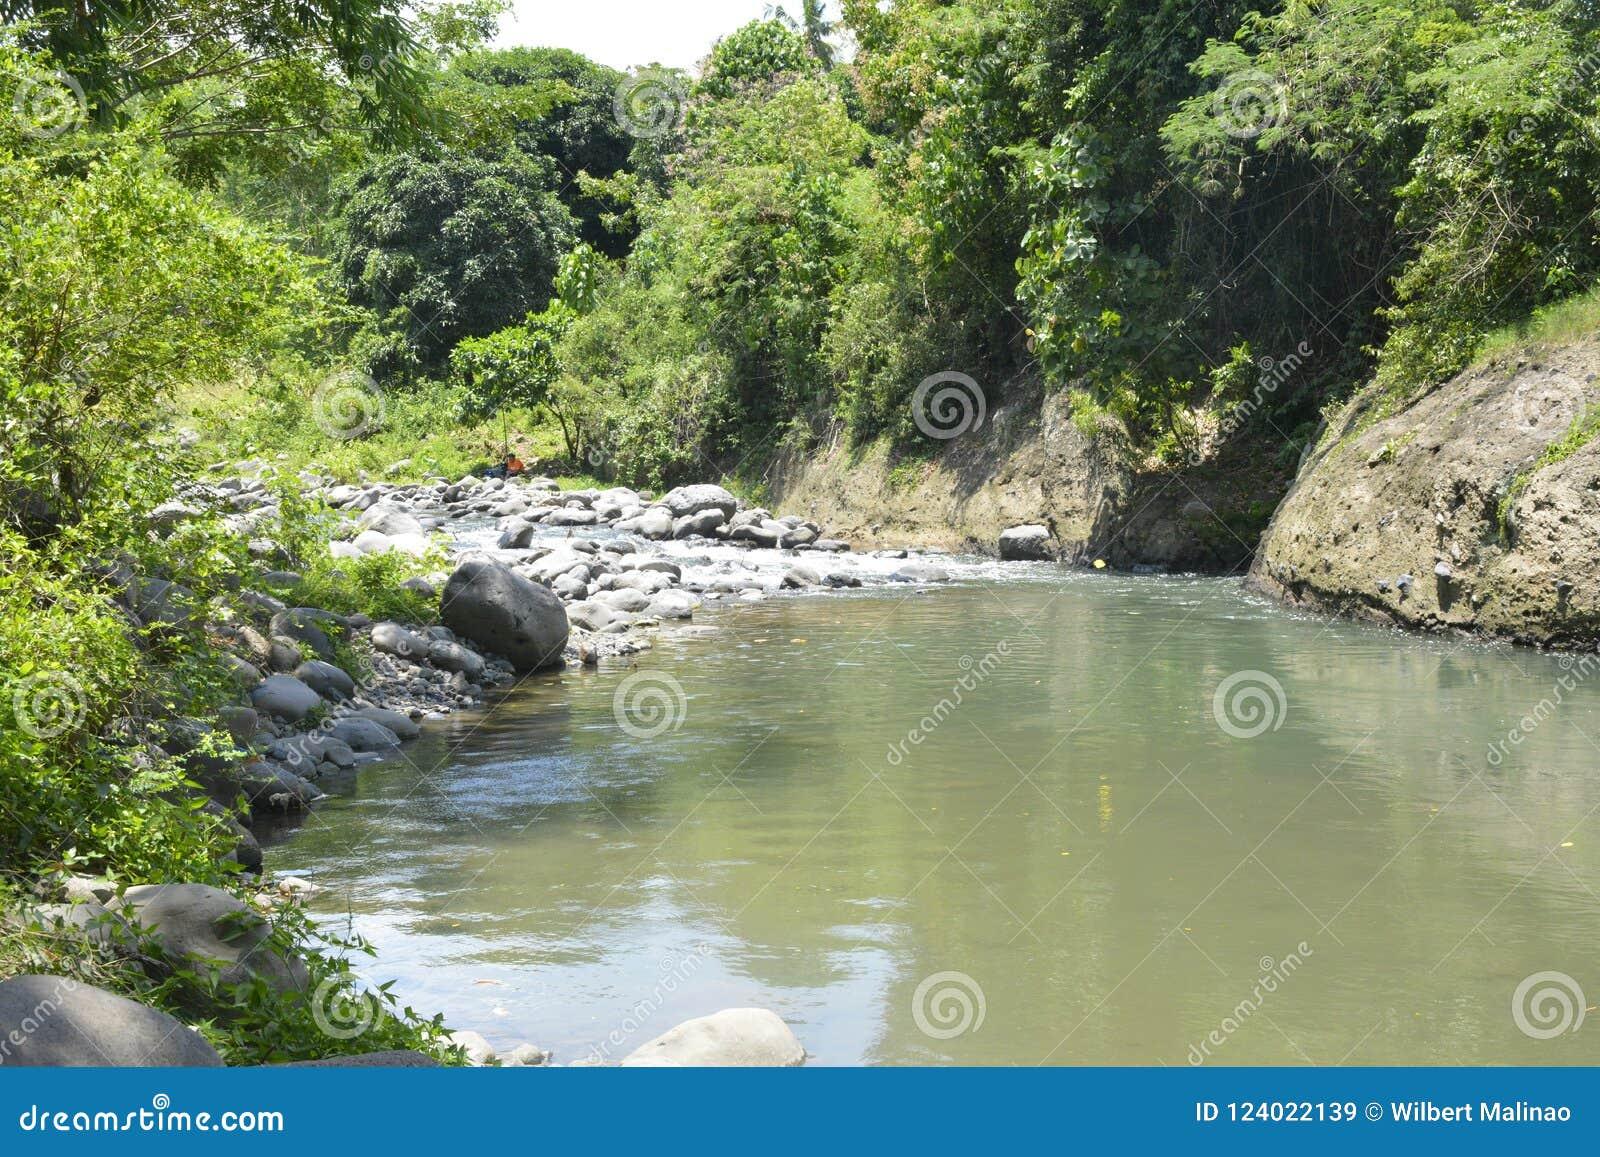 Ruparan河, Digos市,南达沃省,菲律宾的岩石部分barangay Ruparan的